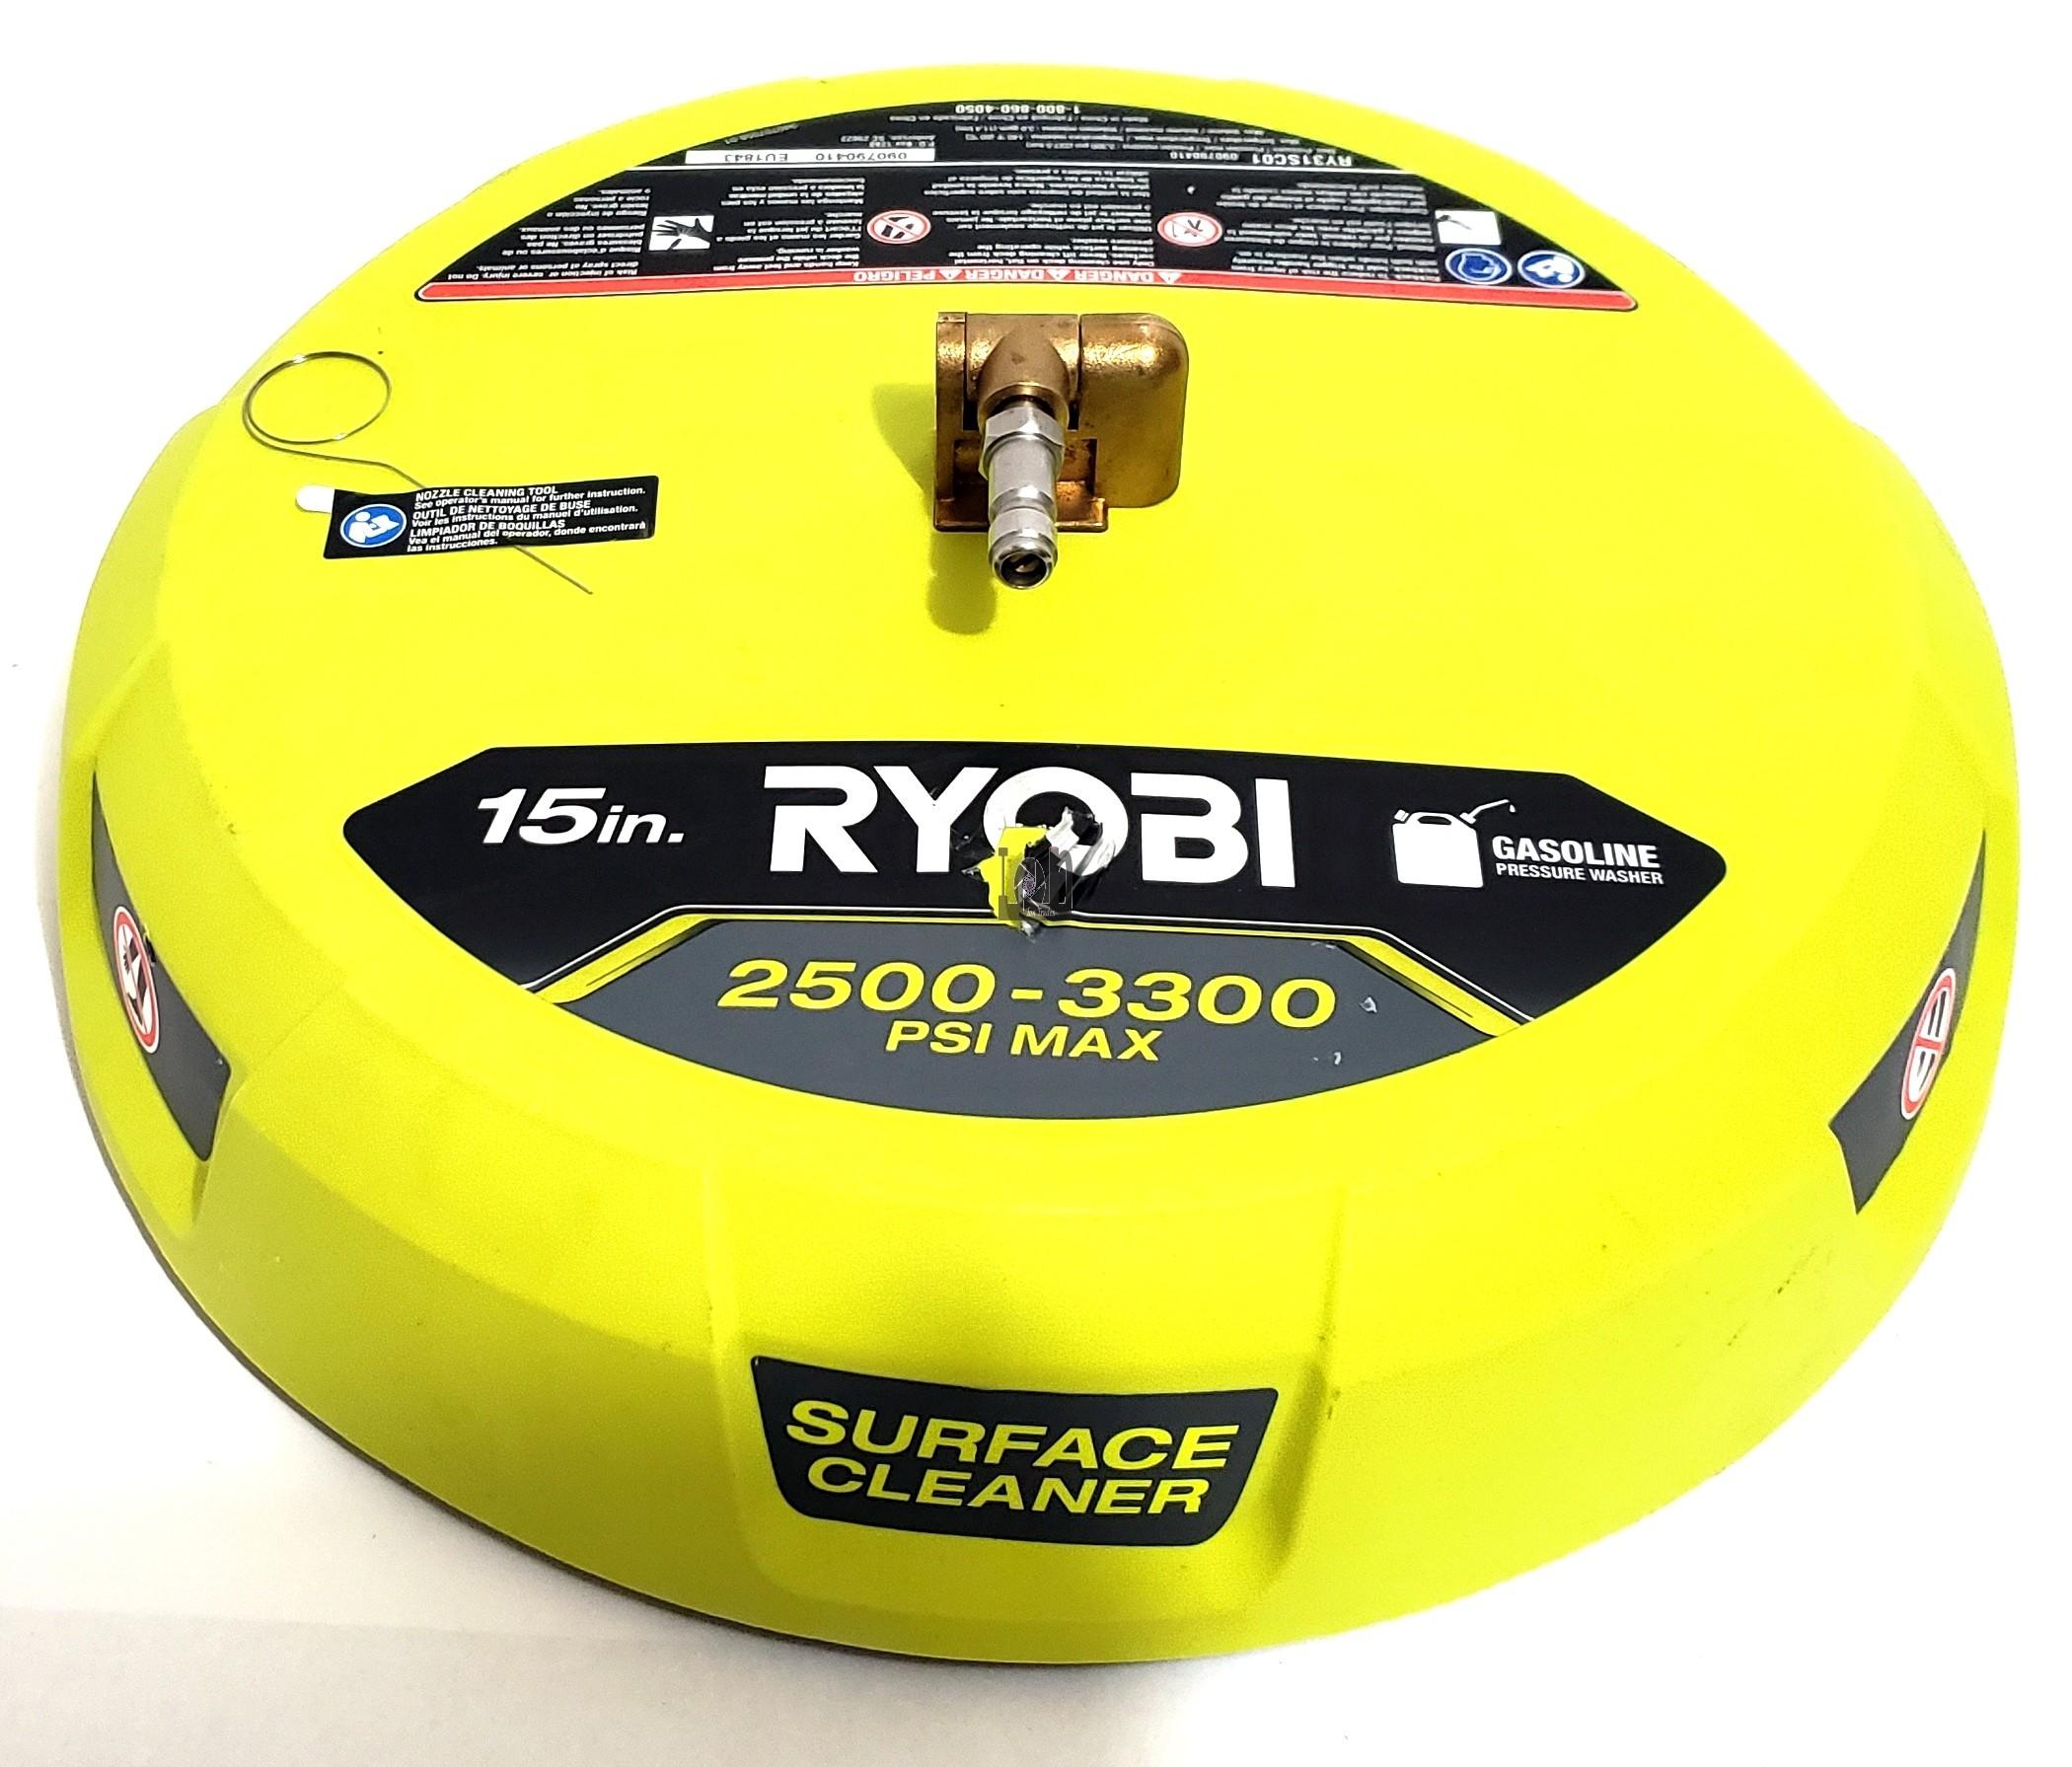 "Ryobi RY31SC01 15"" Surface Cleaner Pressure Washer Attachment"